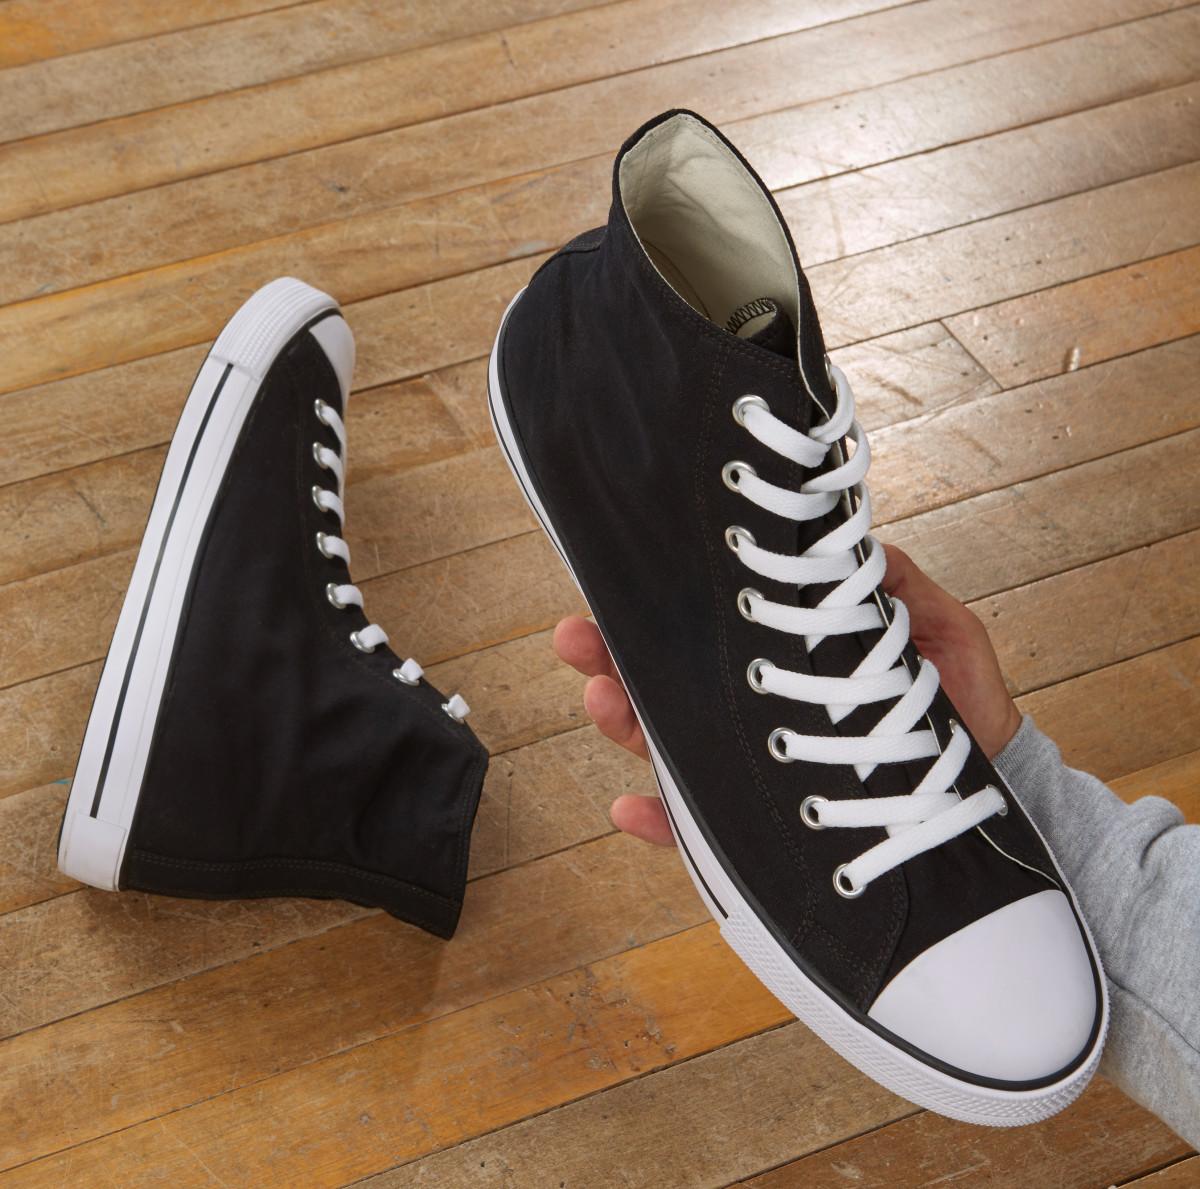 SG Footprints Adult High Top Shoe -1